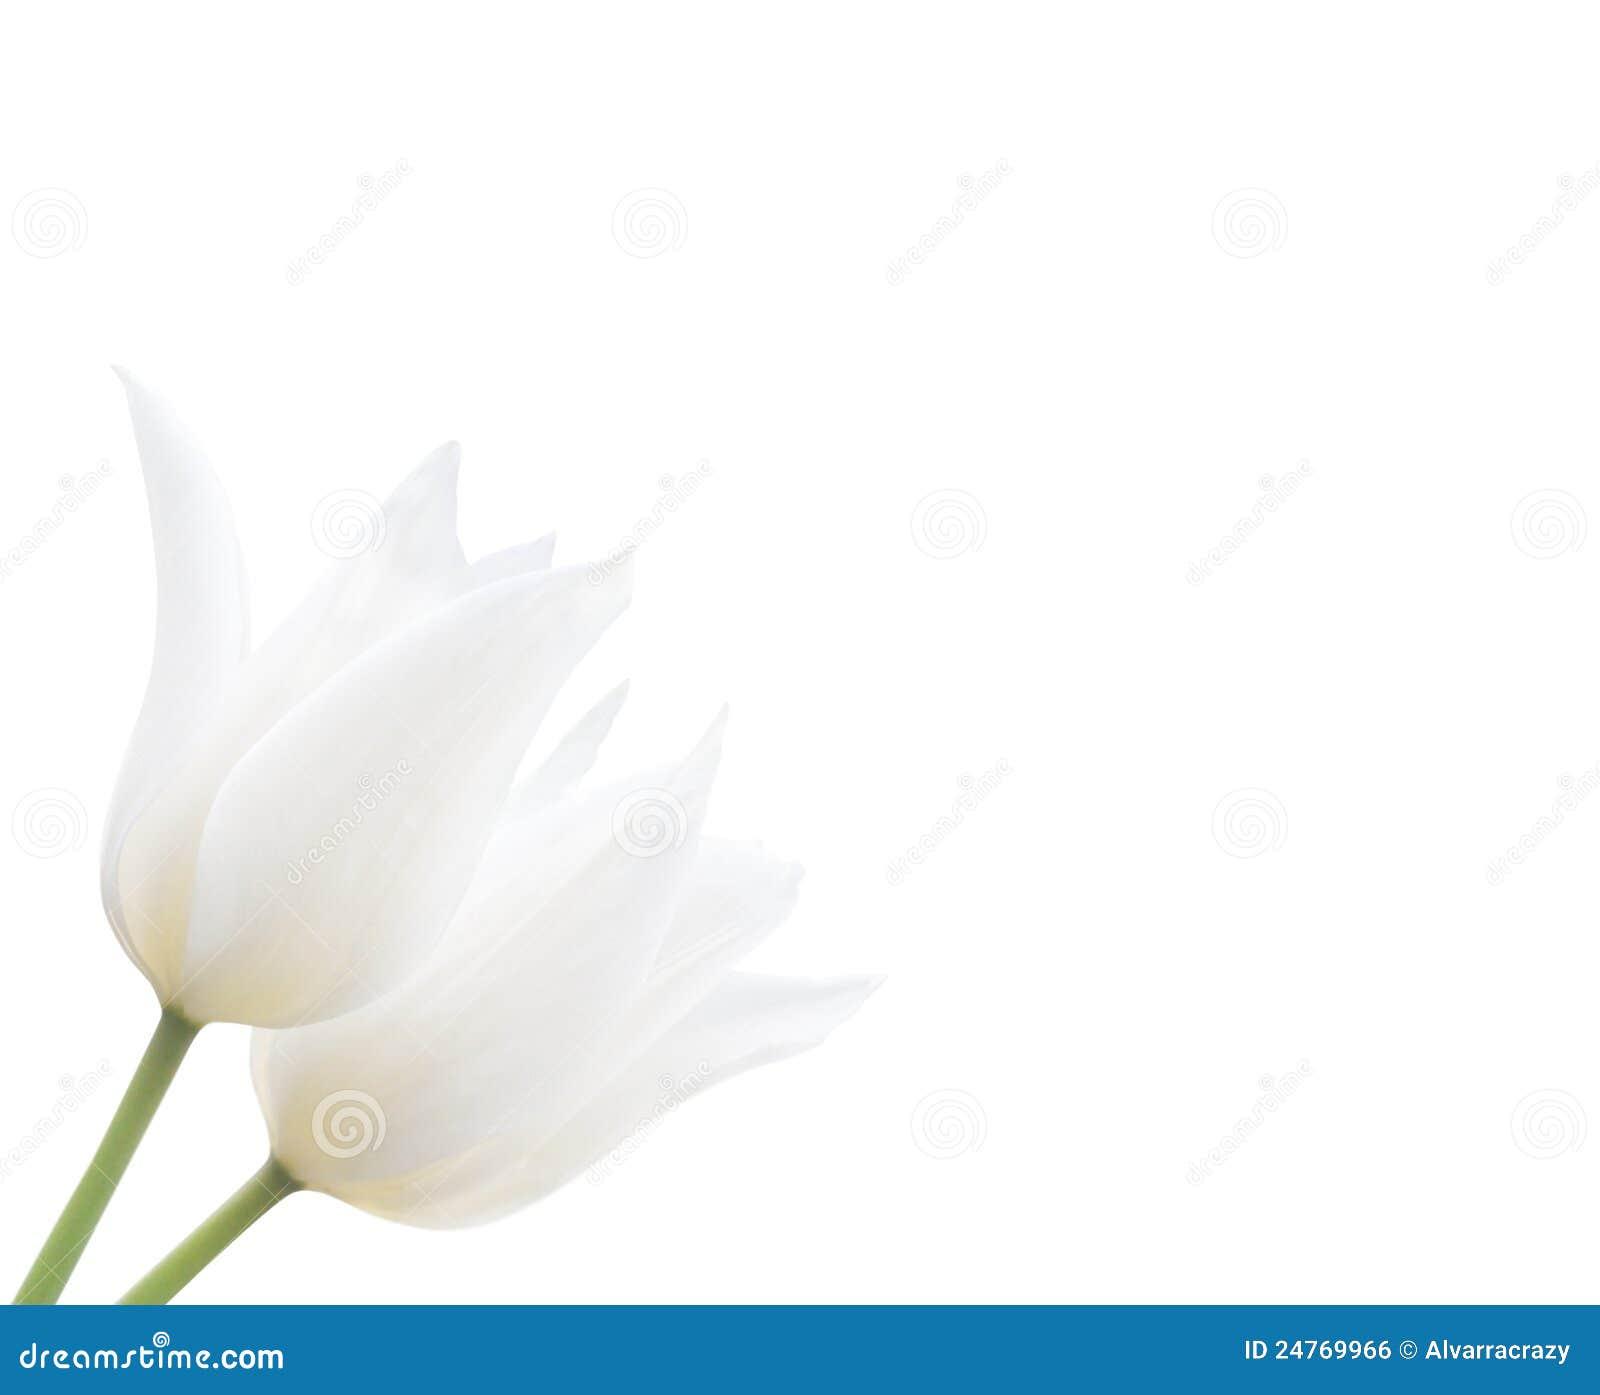 zwei wei e tulpen getrennt auf wei lizenzfreies stockbild bild 24769966. Black Bedroom Furniture Sets. Home Design Ideas